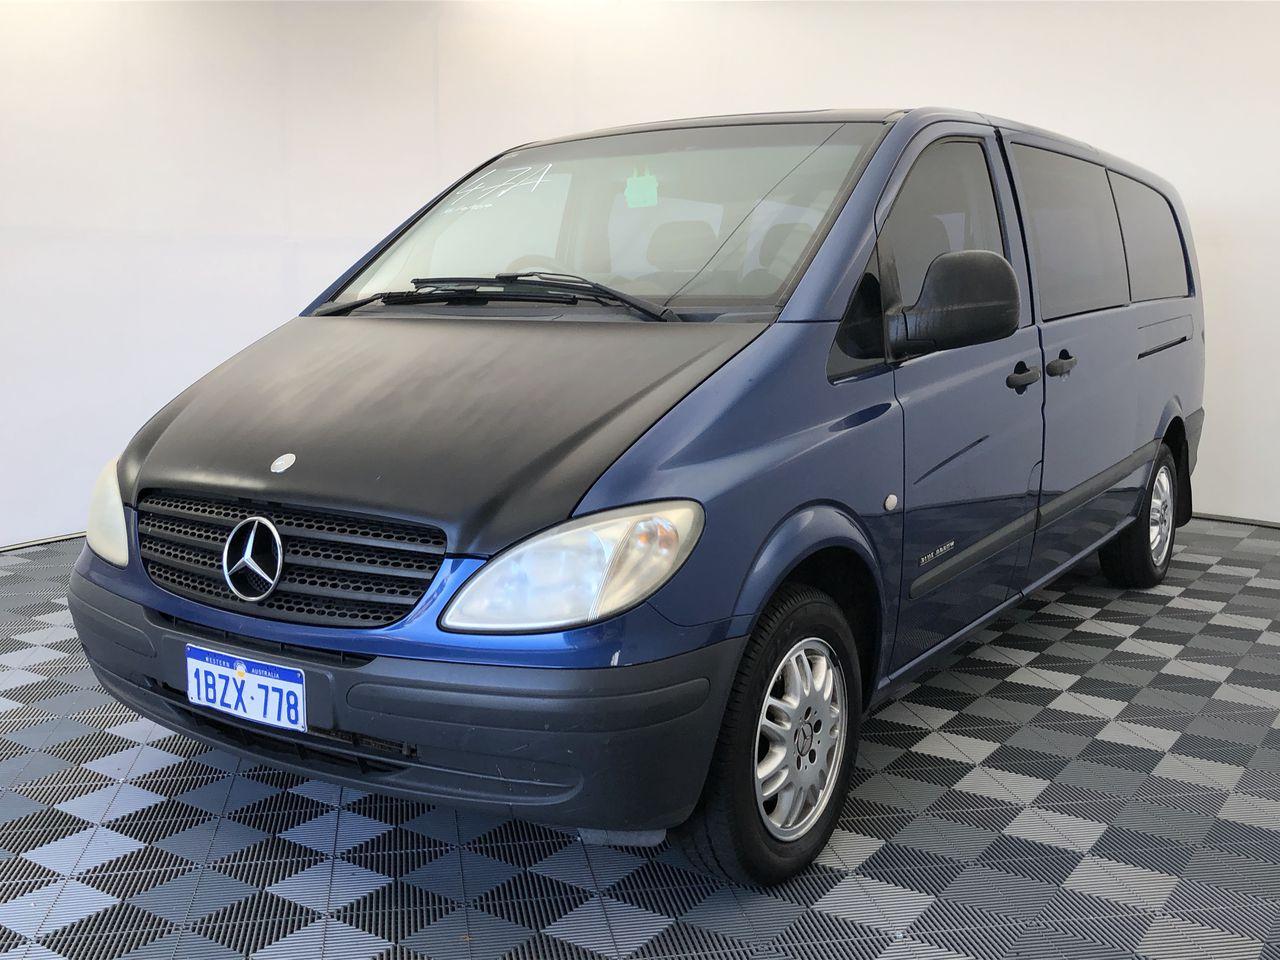 2005 Mercedes Benz Vito 115CDI Extra Long Turbo Diesel Auto Crew Cab Van